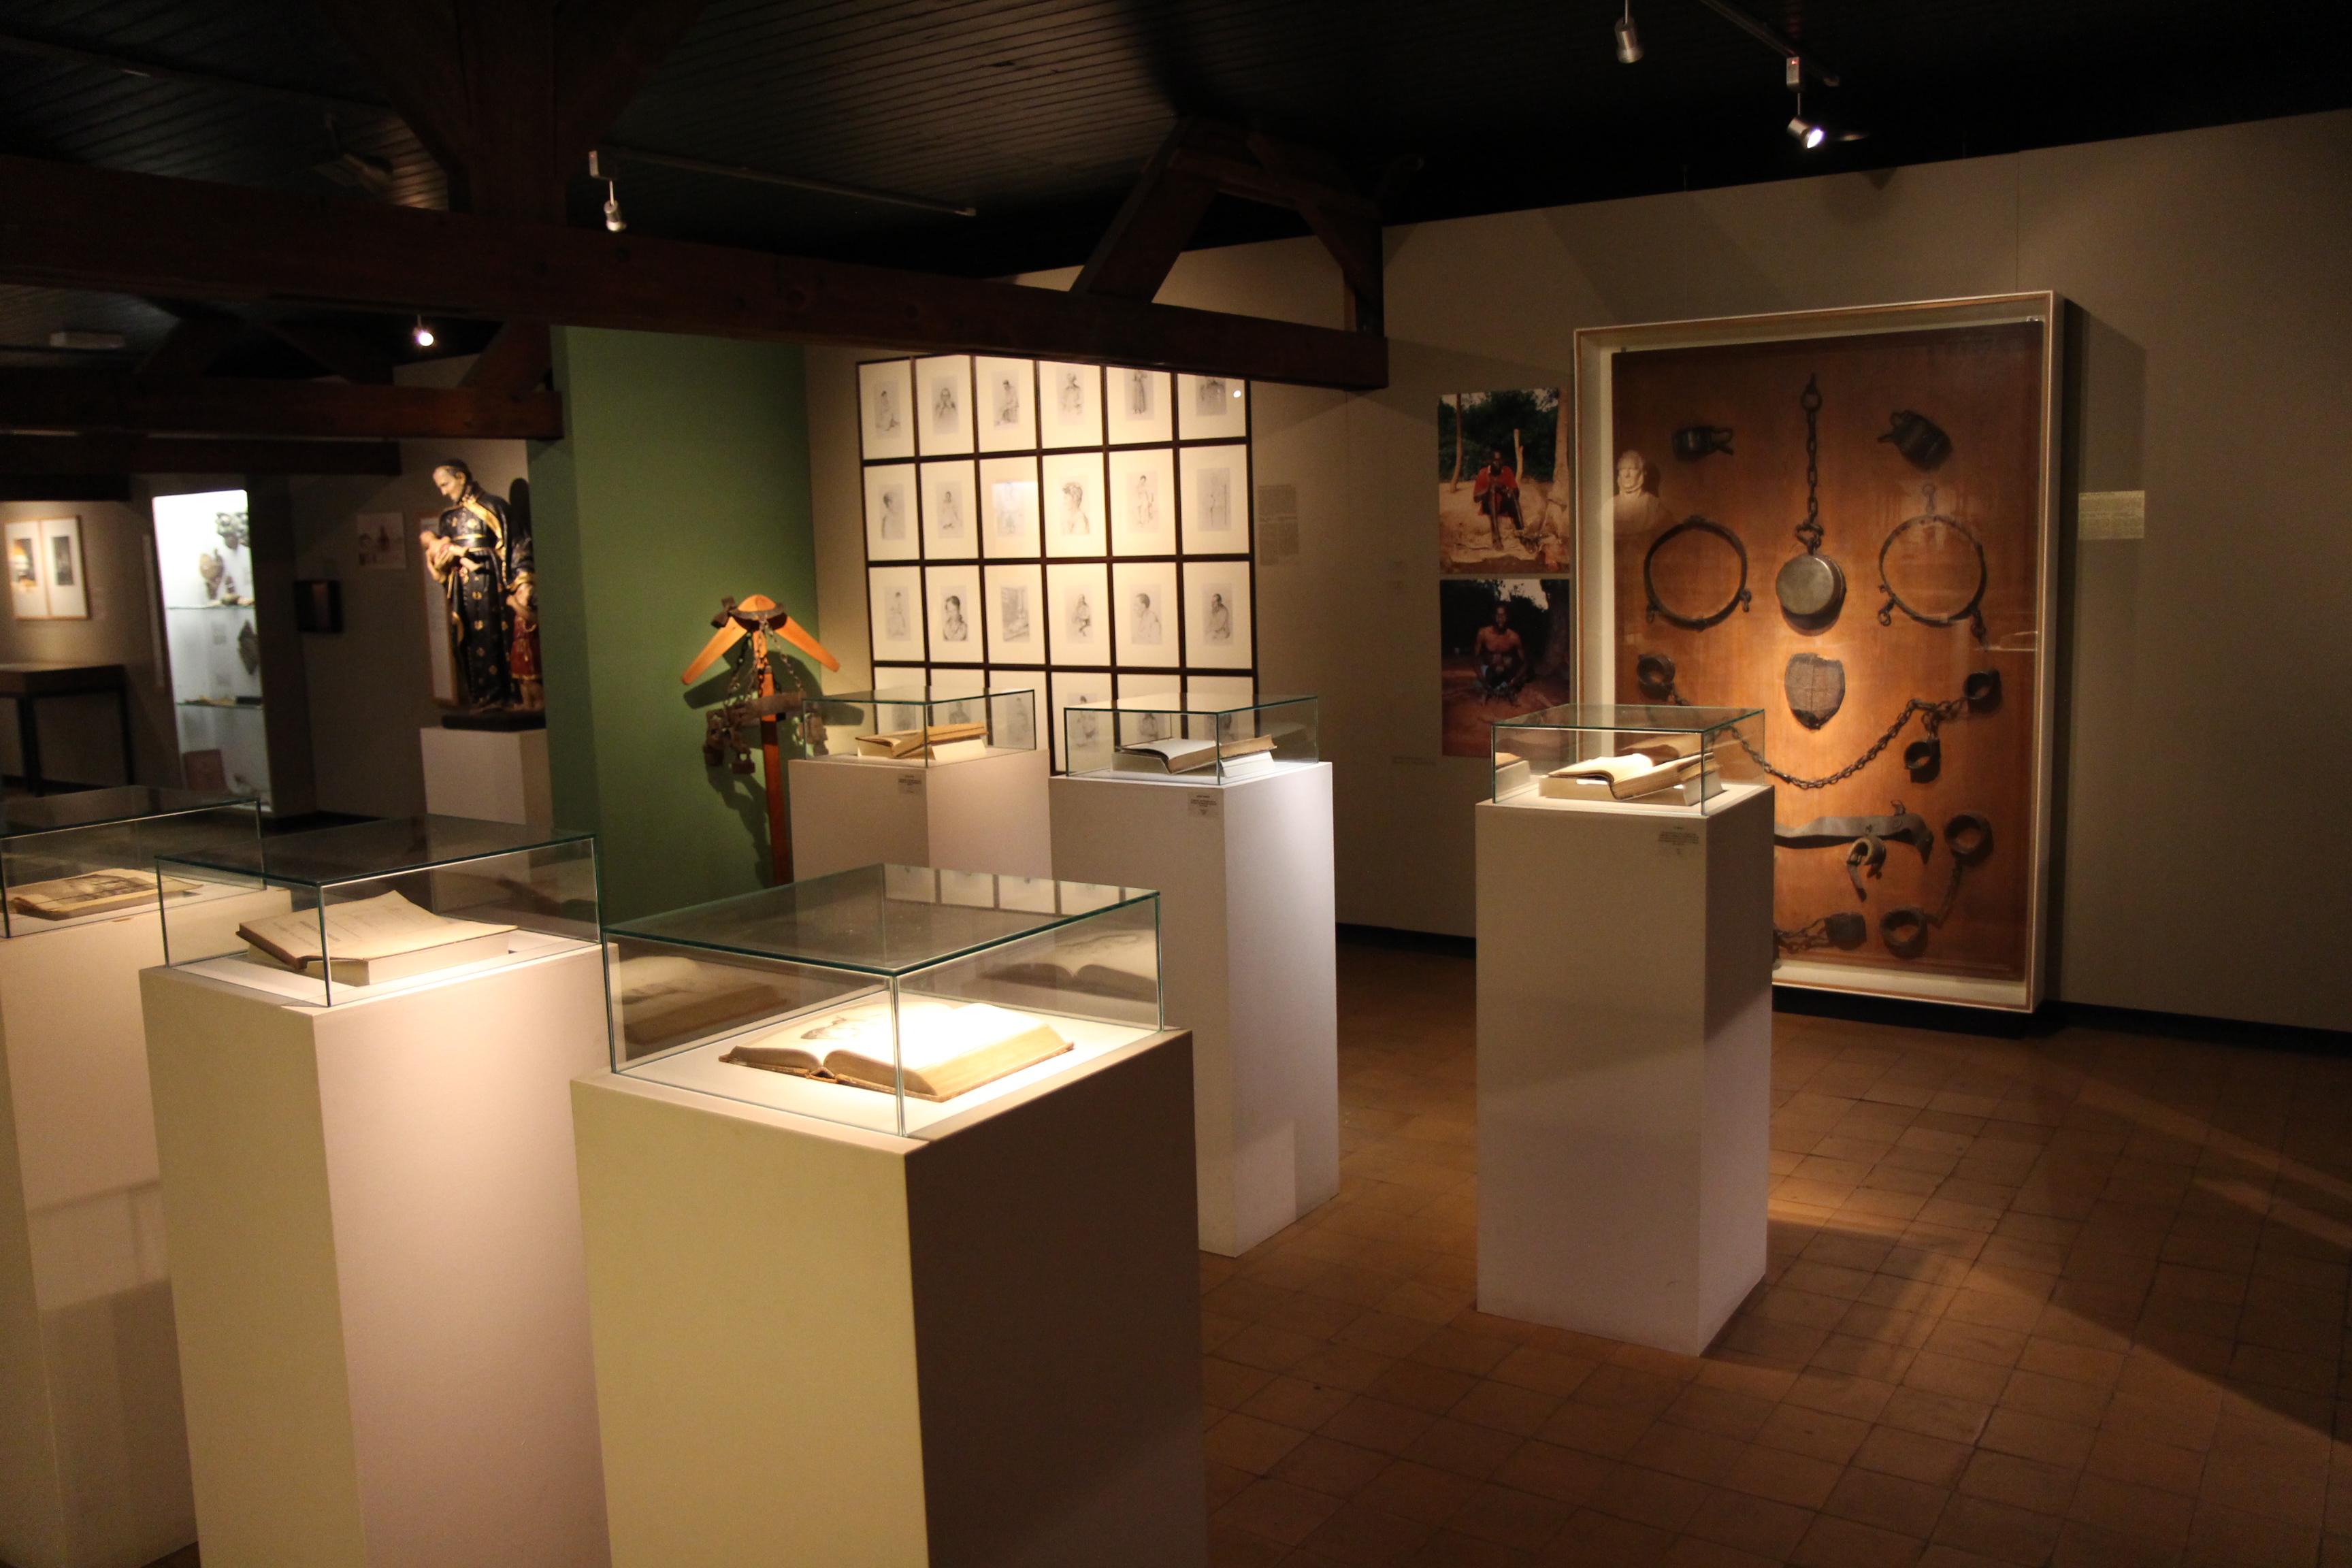 File:Interieur Museum Dr. Guislain Geschiedenis van de psychiatrie ...